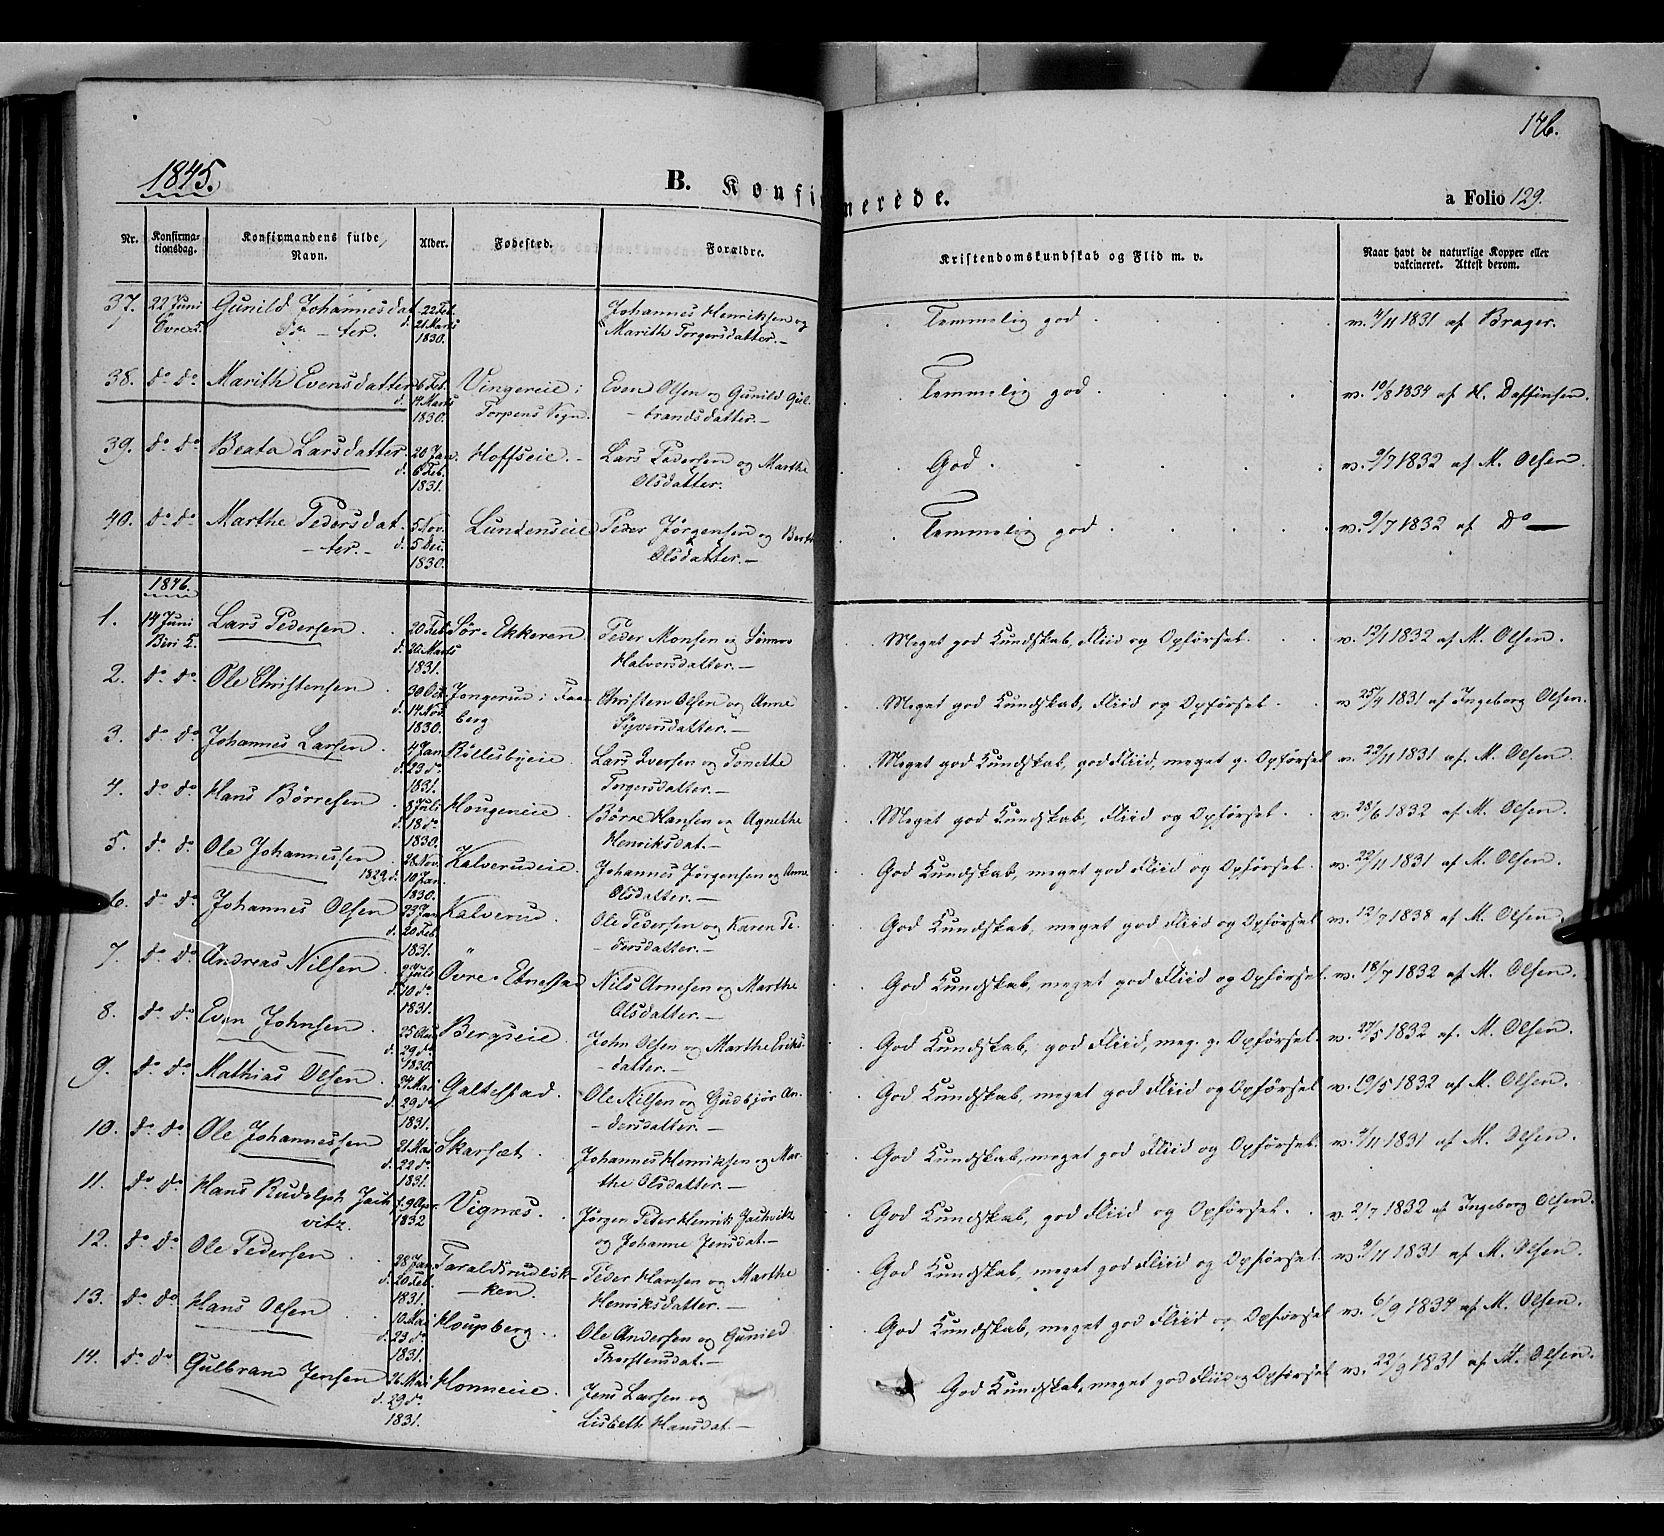 SAH, Biri prestekontor, Ministerialbok nr. 5, 1843-1854, s. 146